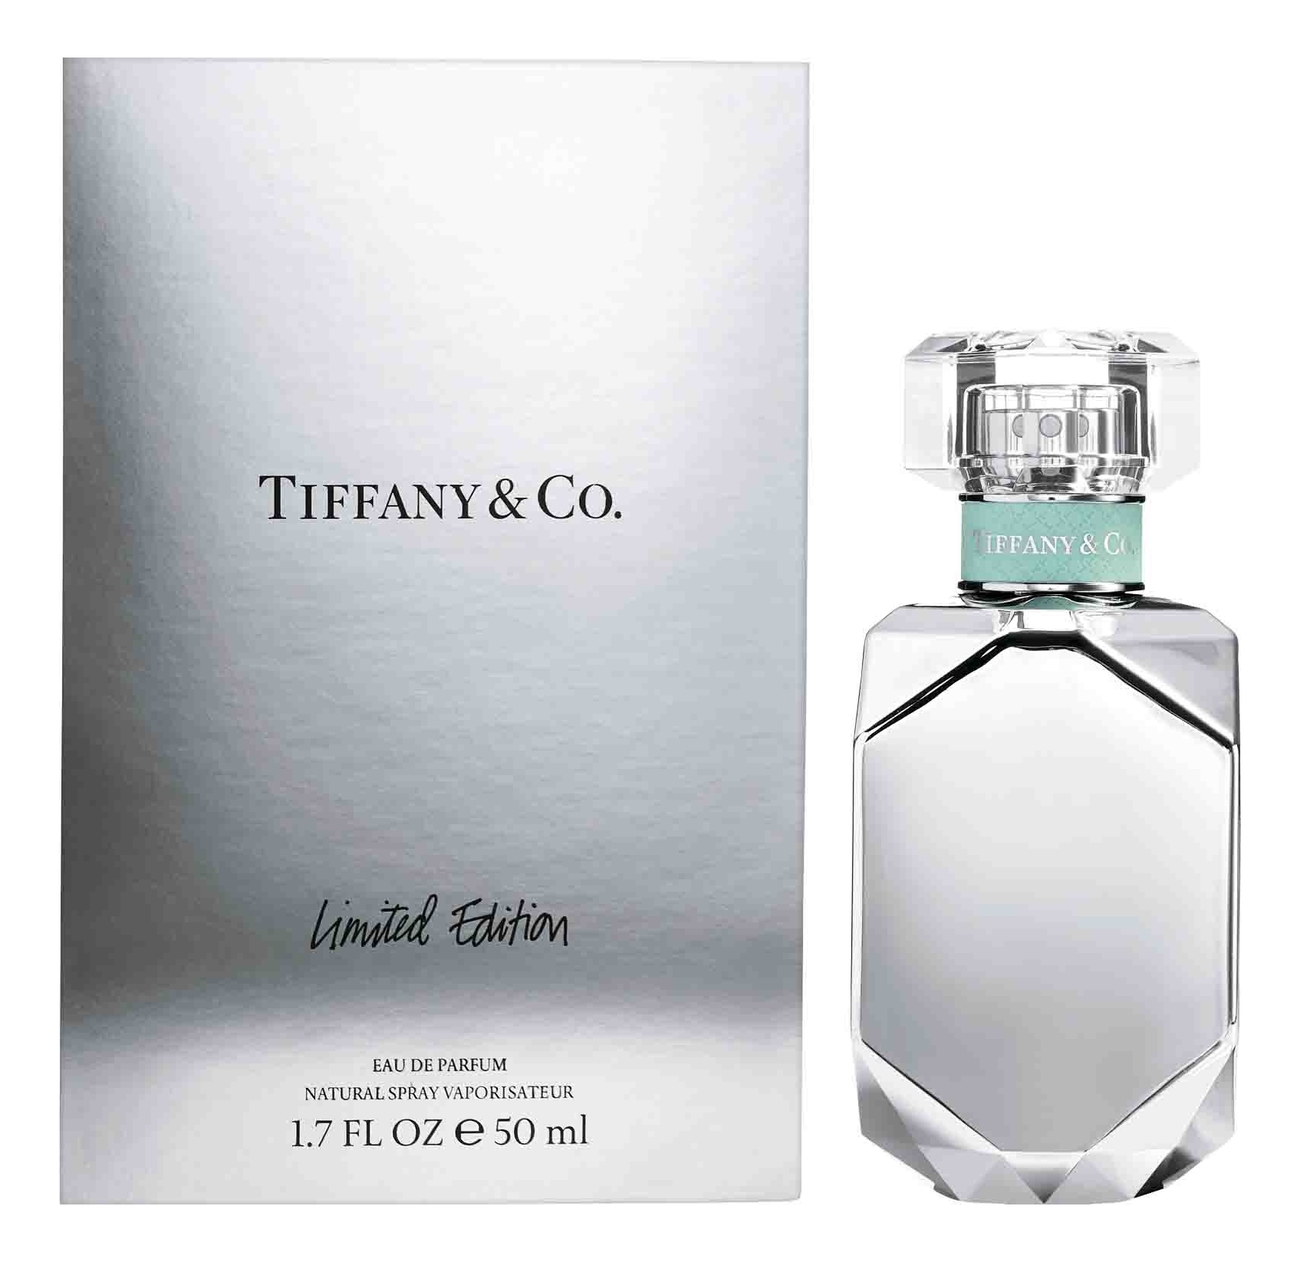 Купить & Co Limited Edition Tiffany: парфюмерная вода 50мл, & Co Limited Edition Tiffany